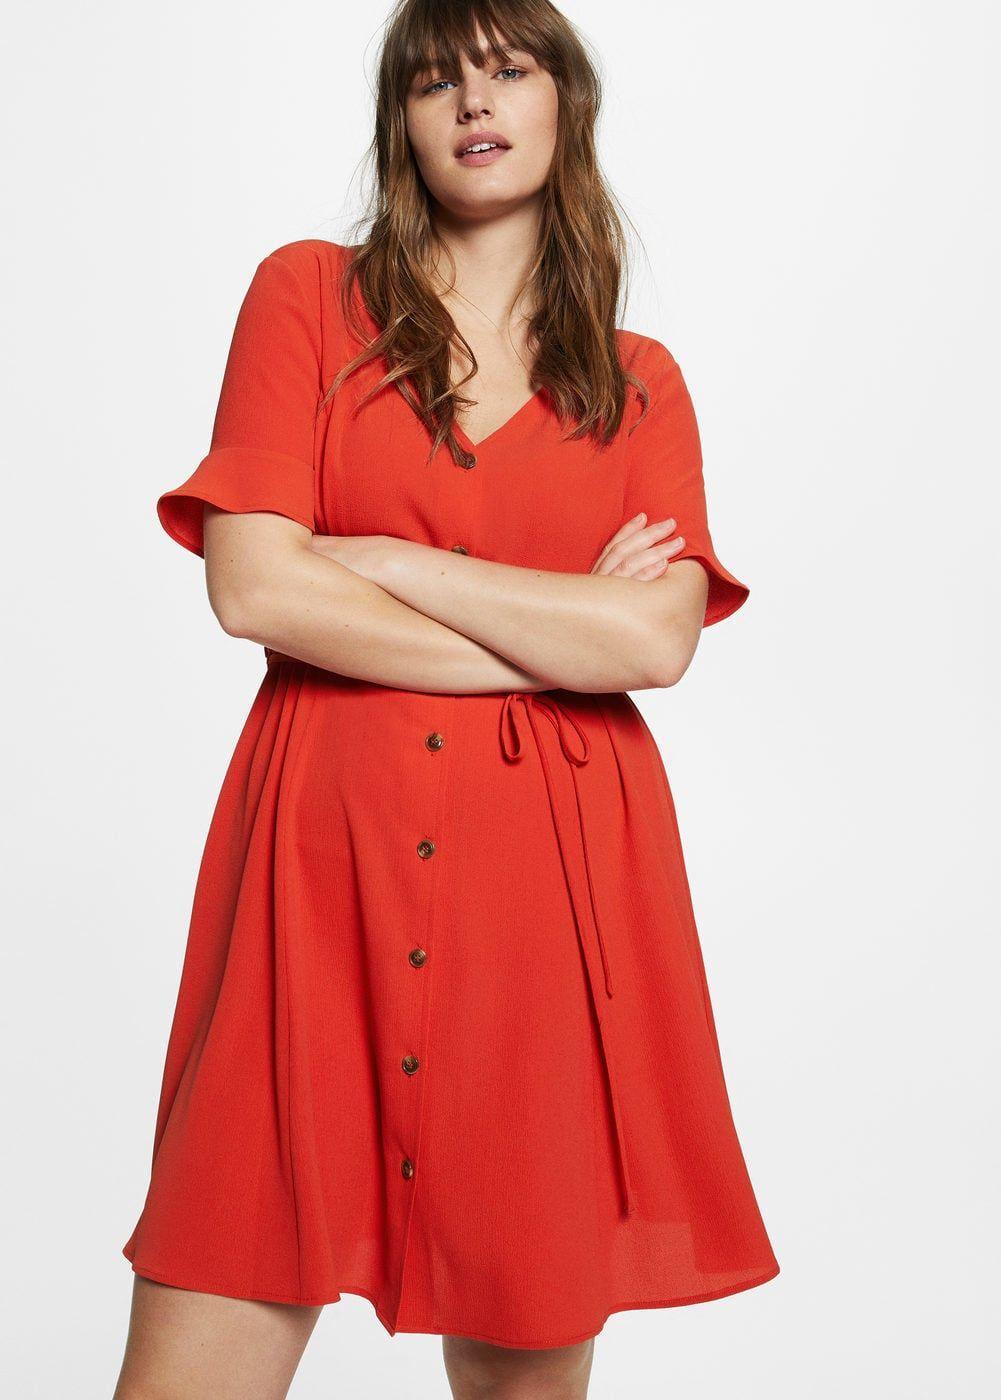 Robe Courte Boutonnee Grandes Tailles Violeta By Mango France Plus Size Plus Size Fashion For Women Fashion